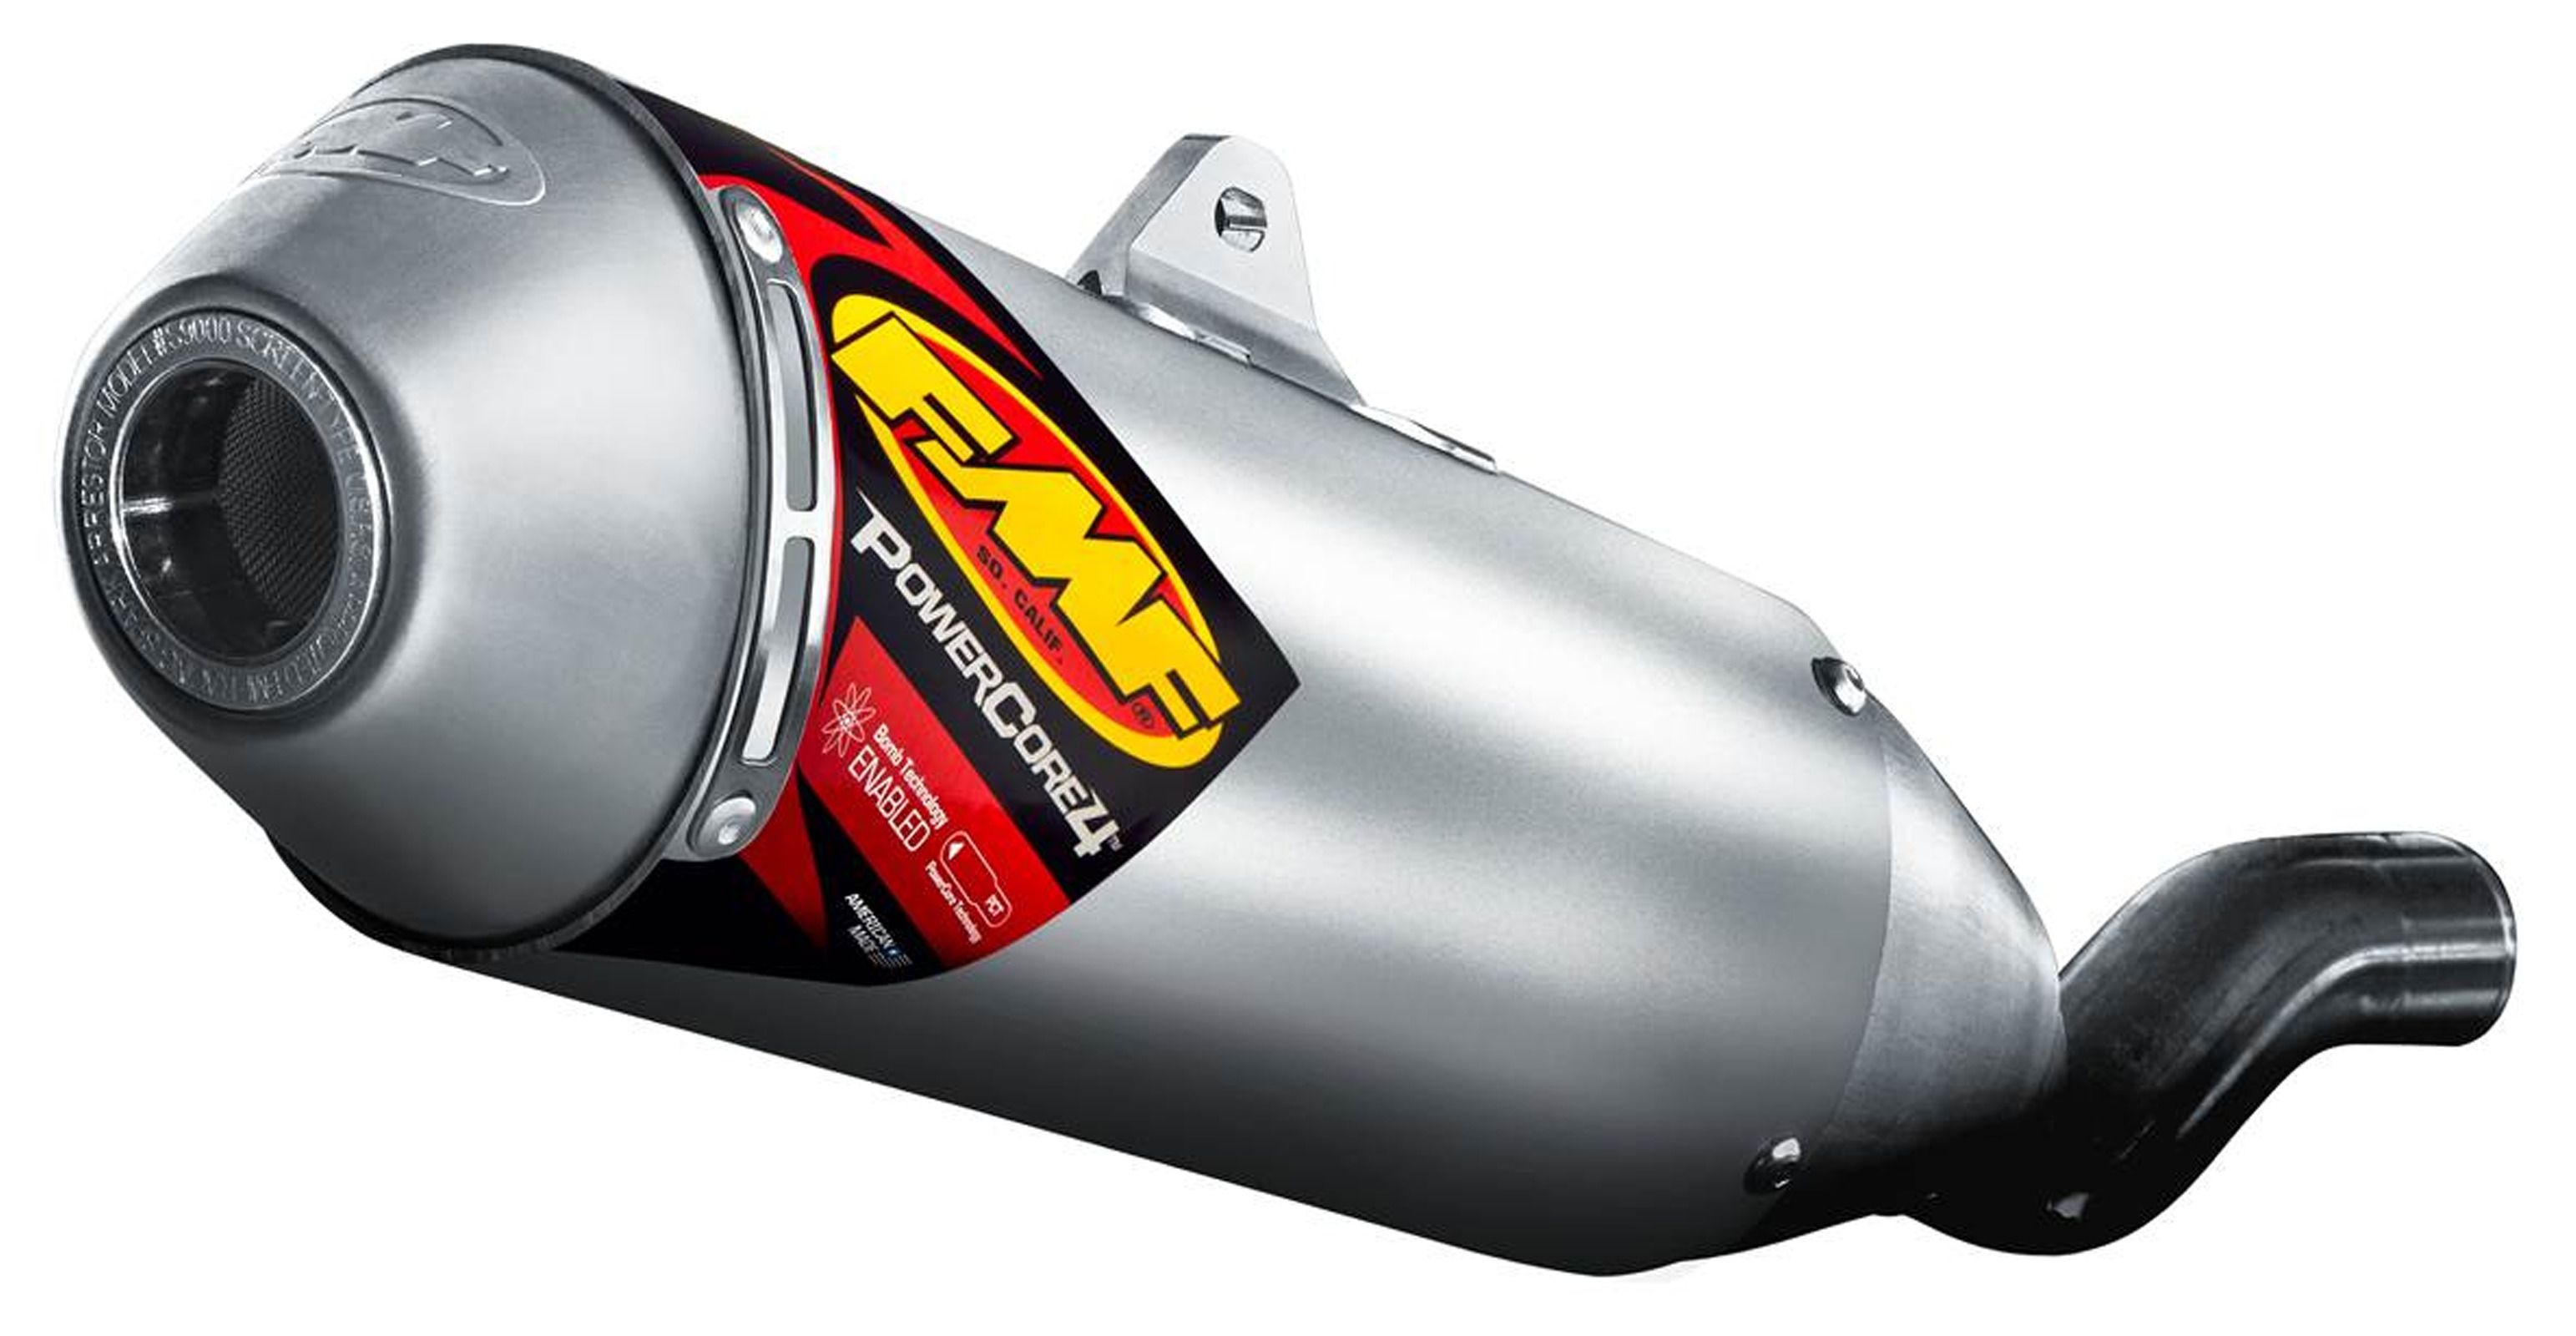 FMF PowerCore 4 Slip-On Exhaust Honda XR600R 1985-2000   10% ($35 00) Off!